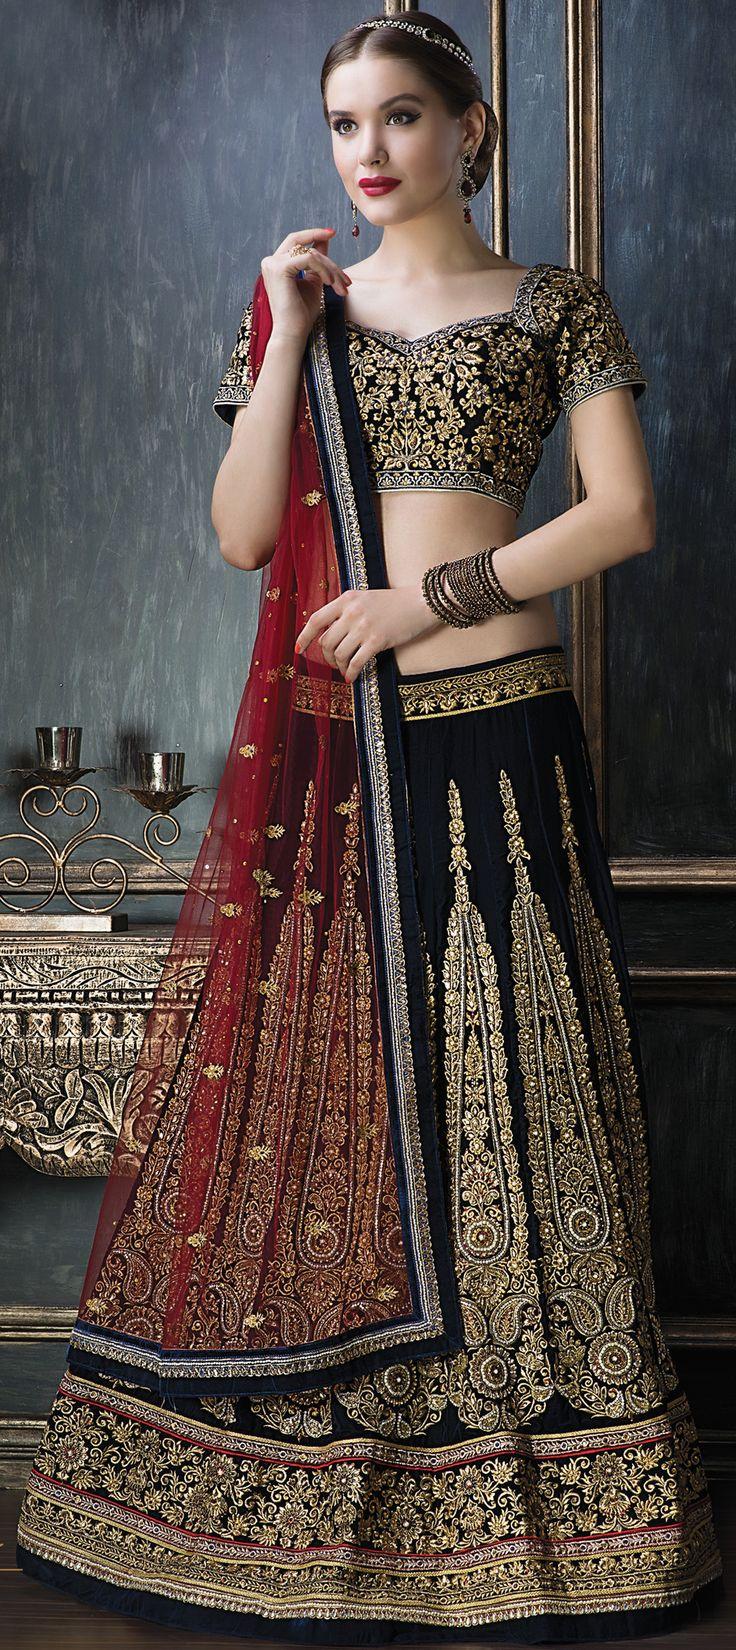 176072: Blue color family Bridal Lehenga, Wedding Lehnga .